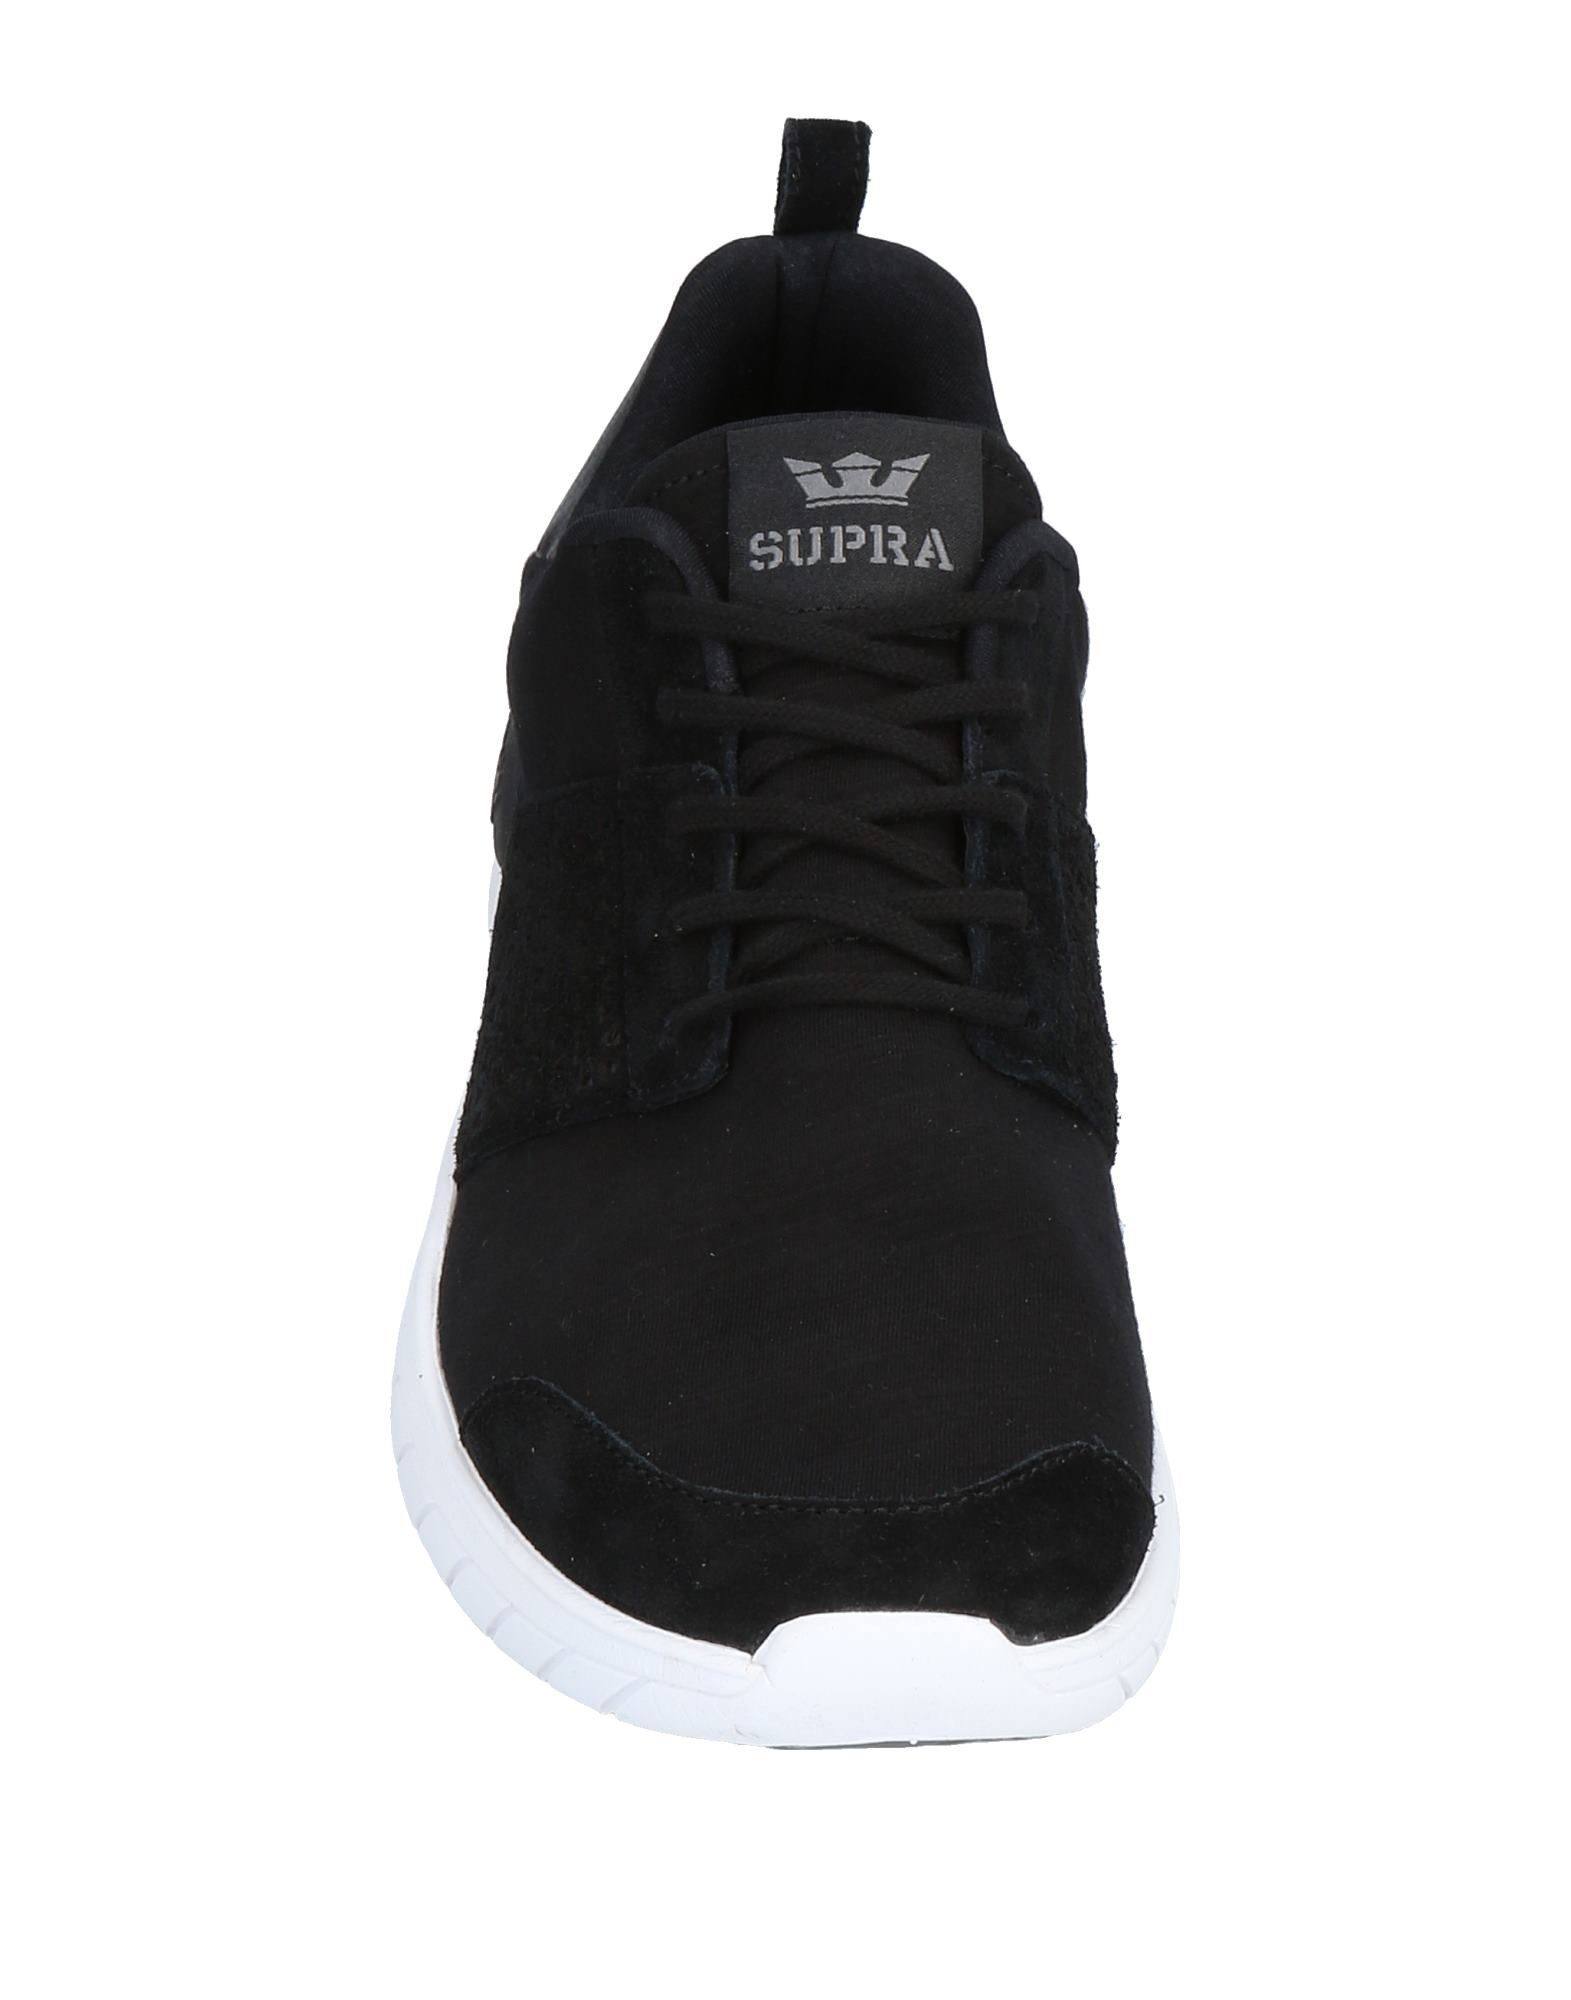 Supra Supra Supra Sneakers Herren Gutes Preis-Leistungs-Verhältnis, es lohnt sich bcfa73